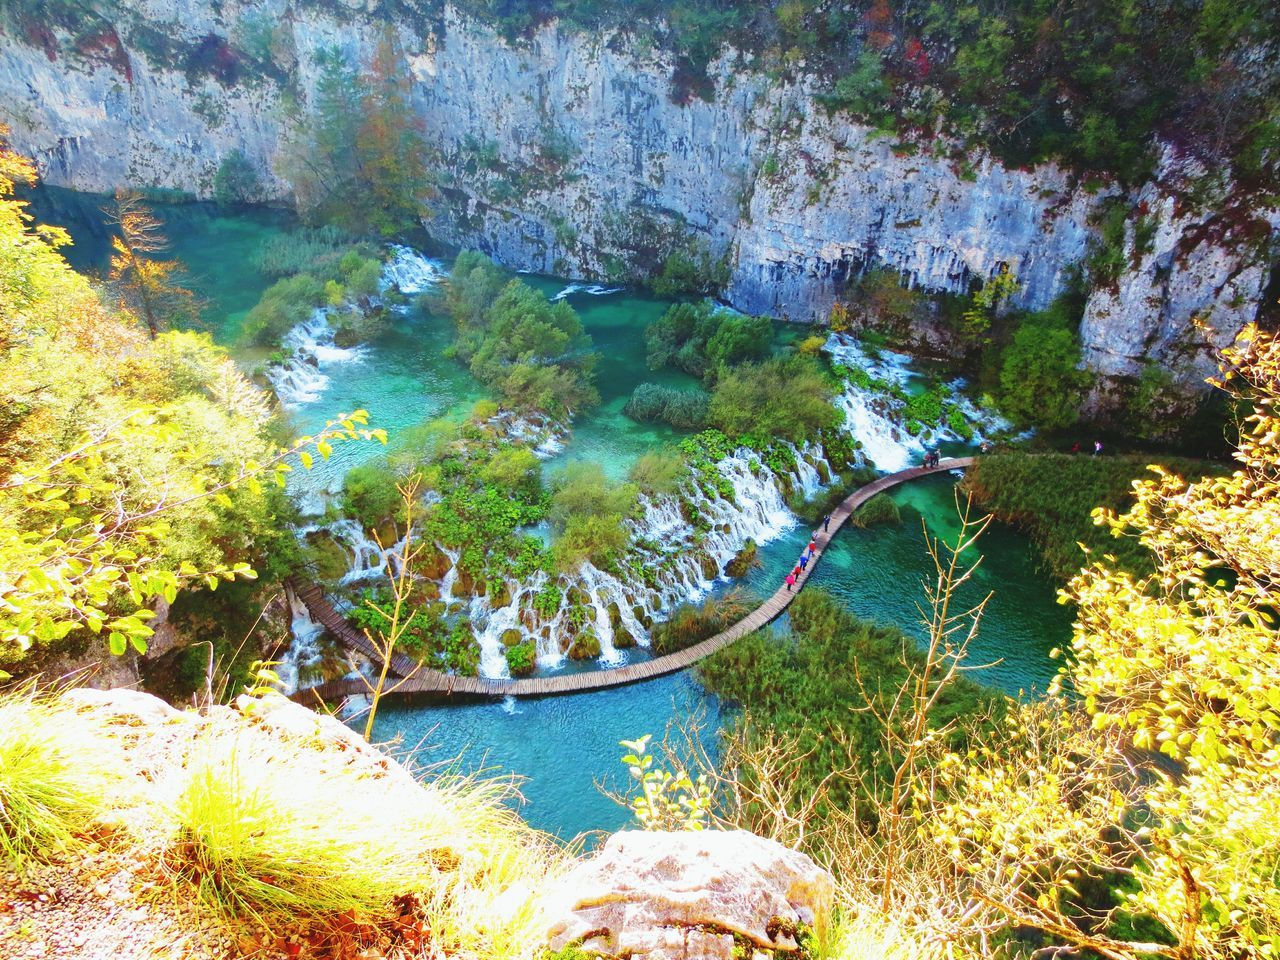 Plitvice National Park Wilderness Nature Beautiful Place EyeEm Nature Lover EyeEm Best Shots Edge Of The World